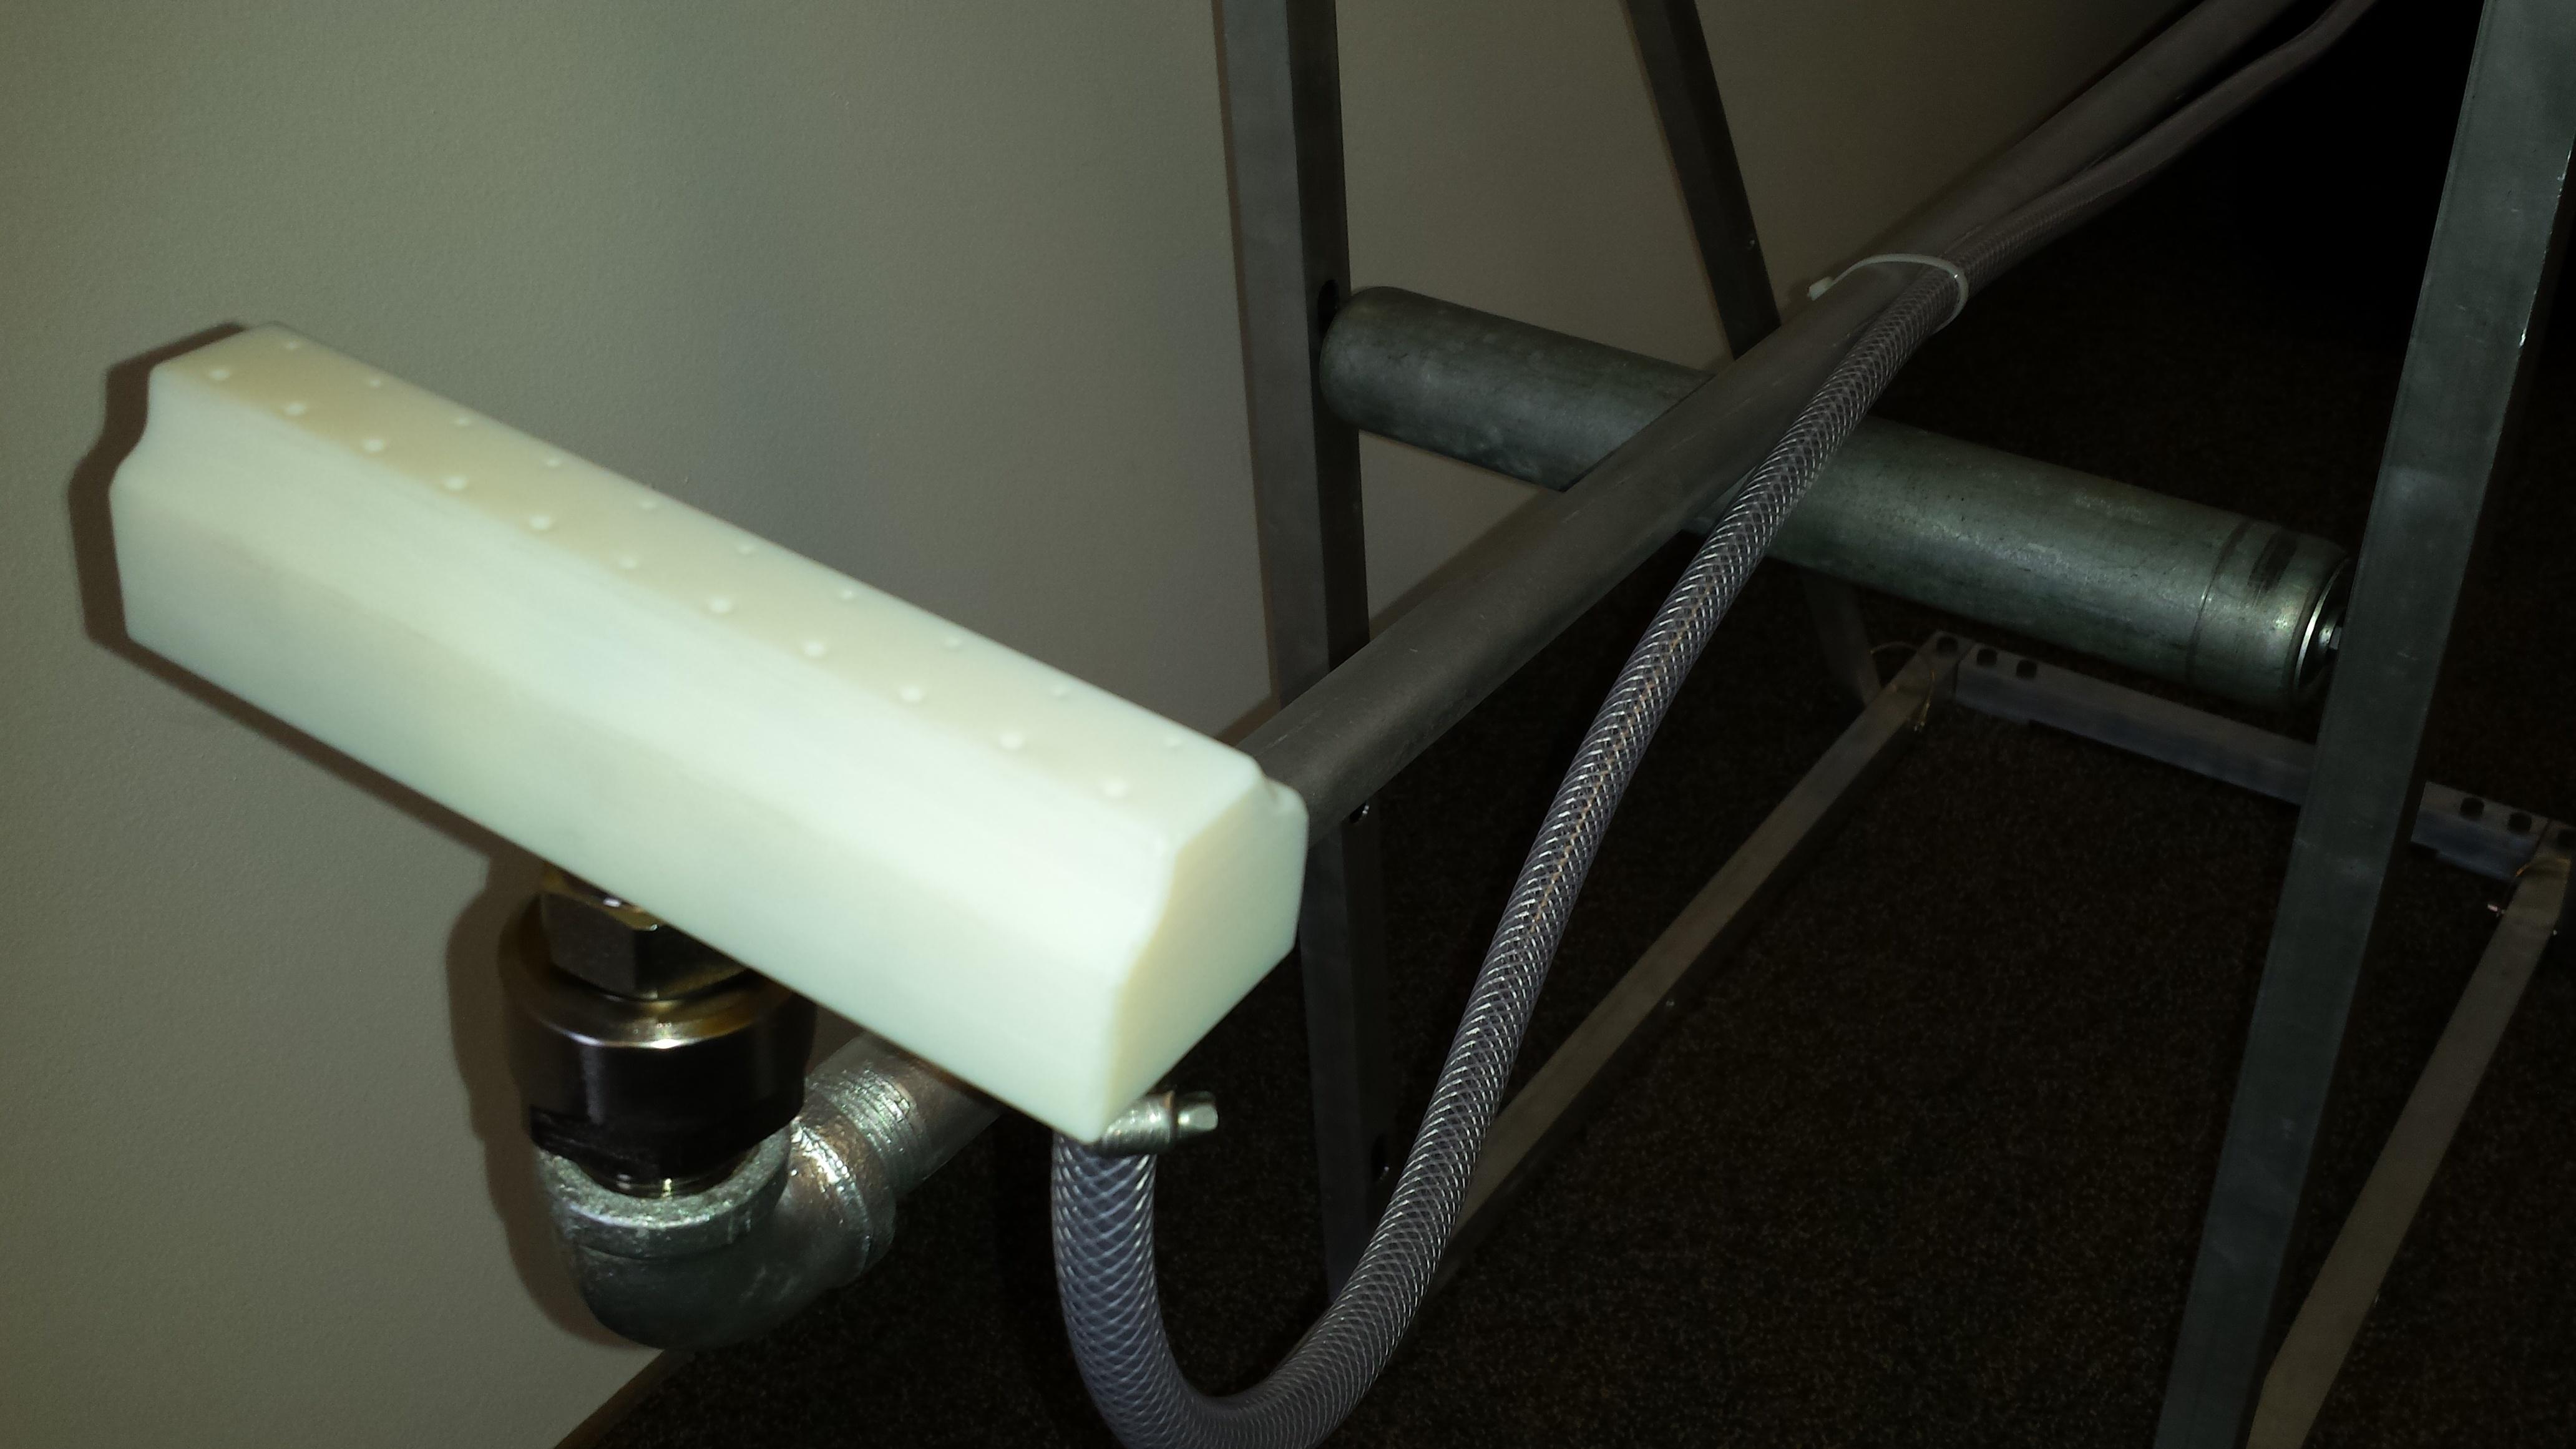 Hurricane wand and roller stand - 2.jpg